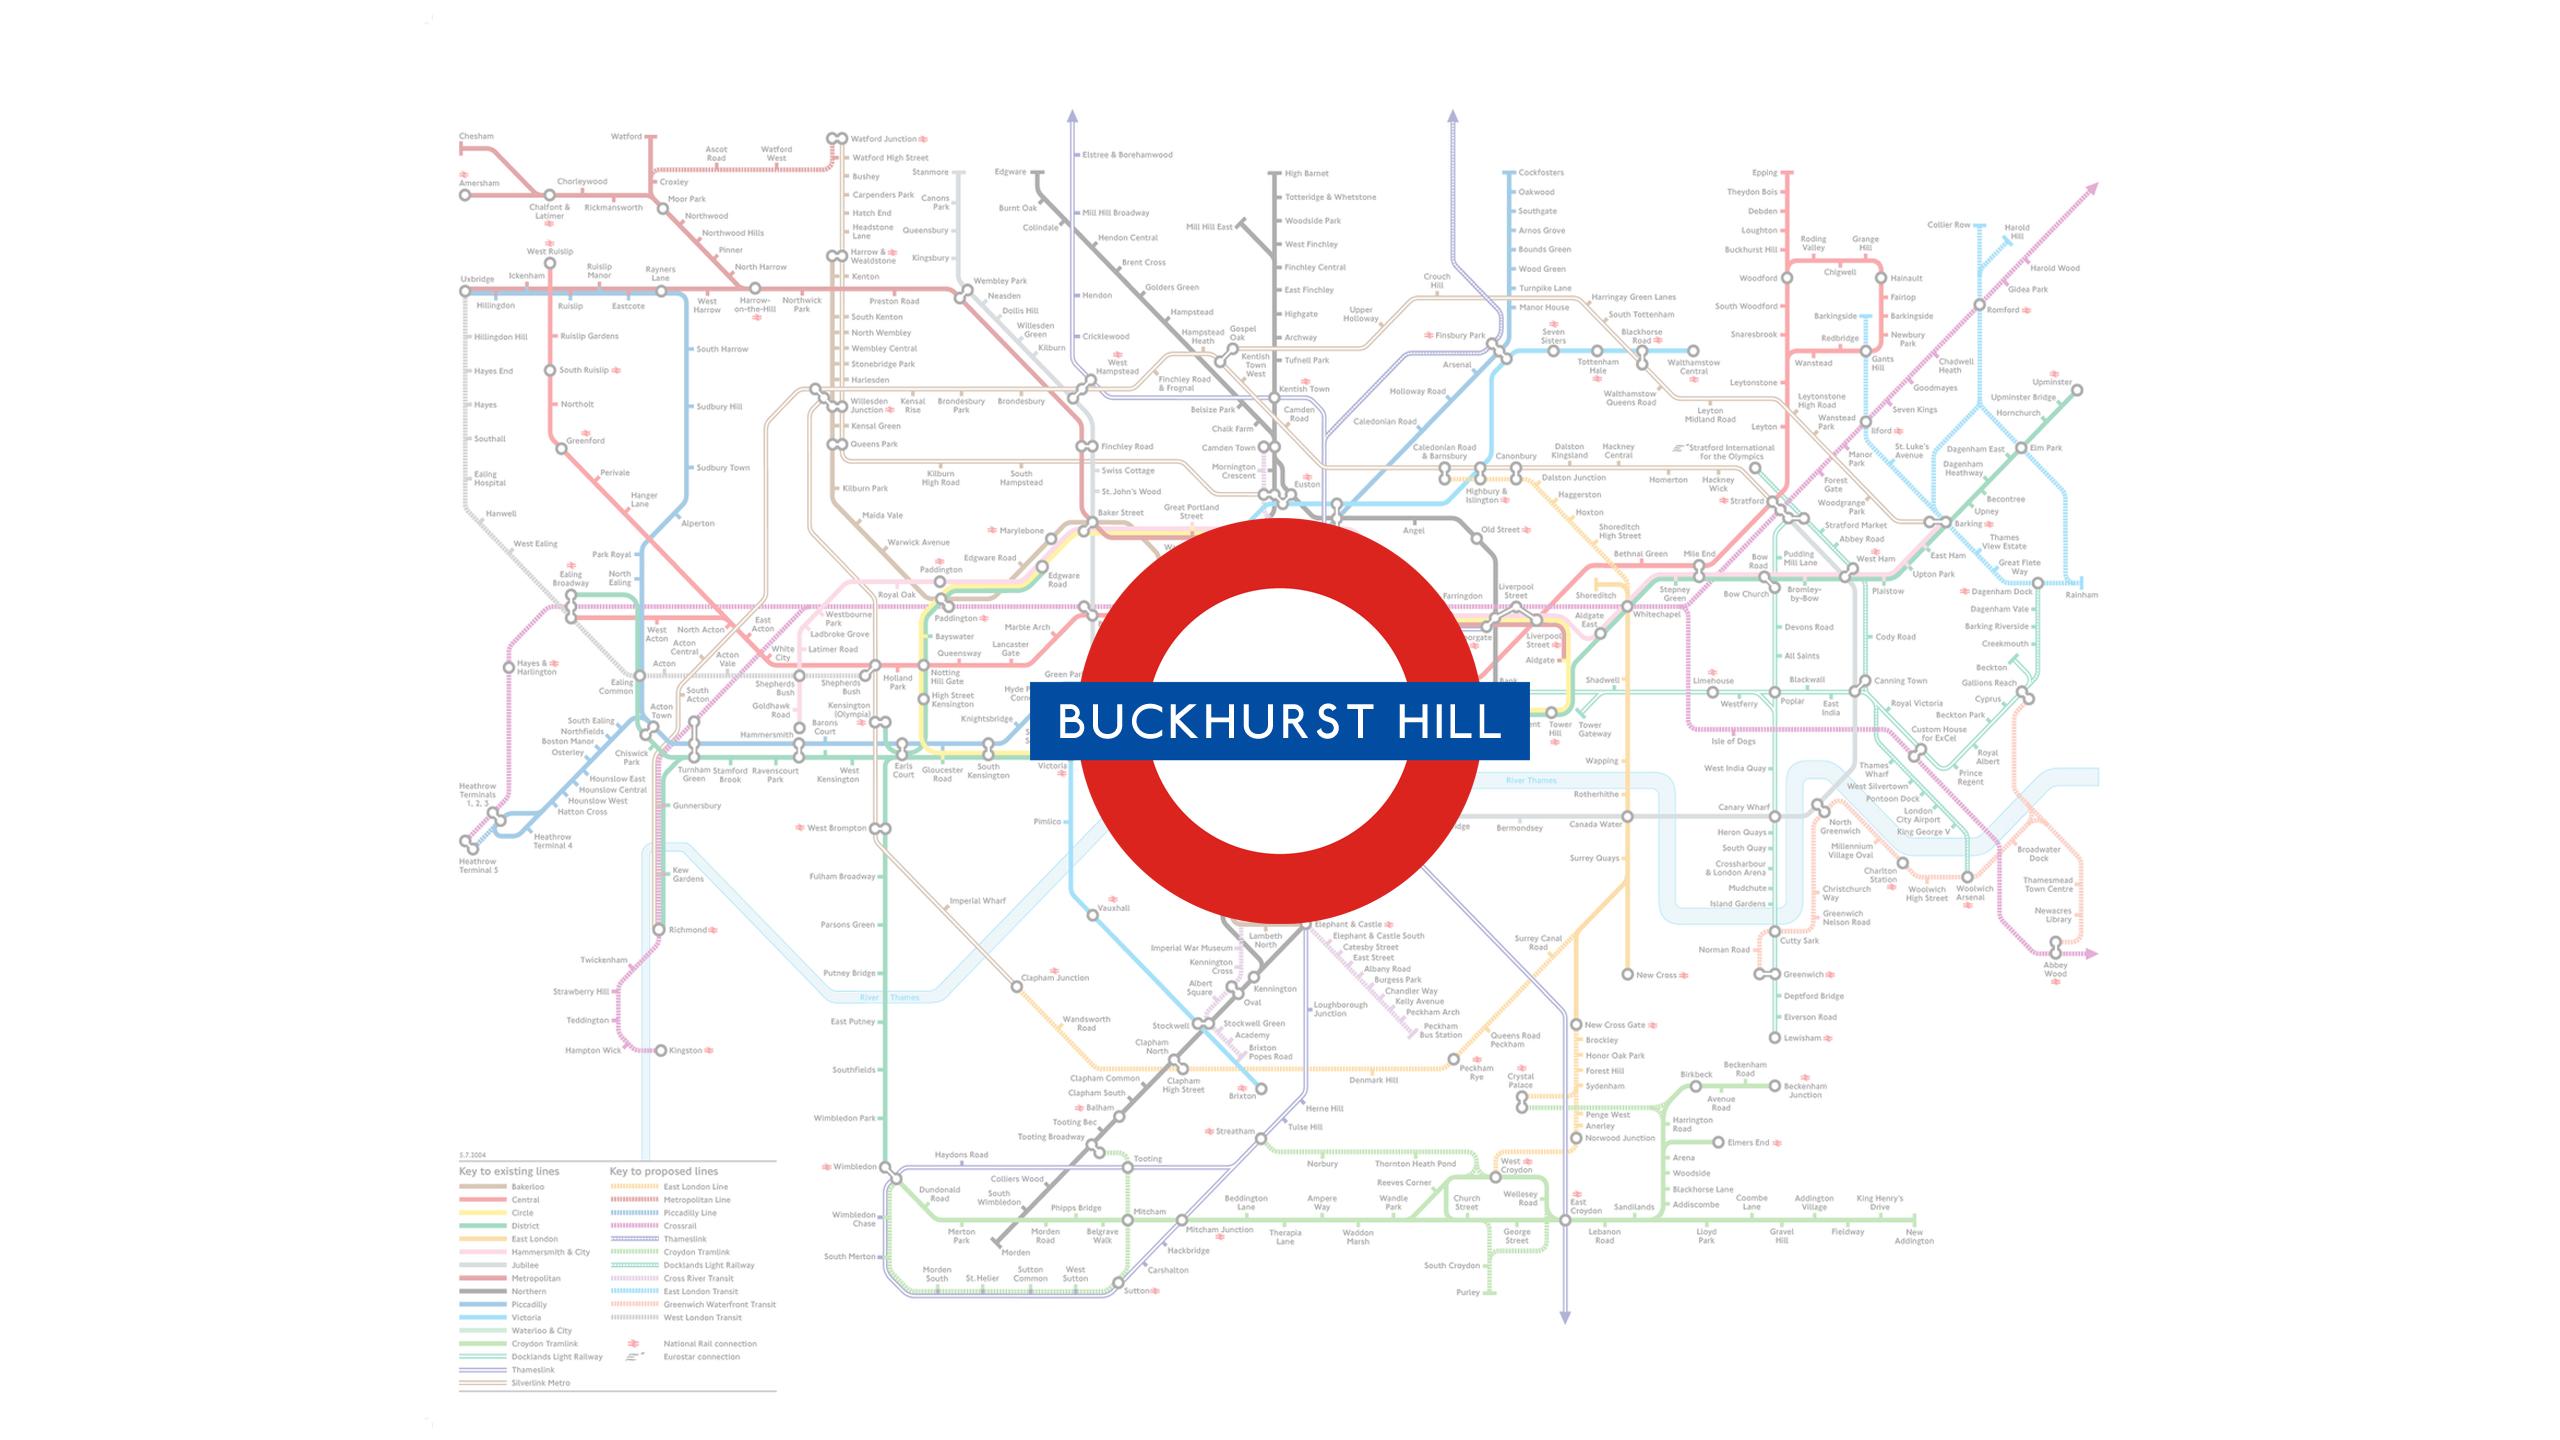 Buckhurst Hill (Map)